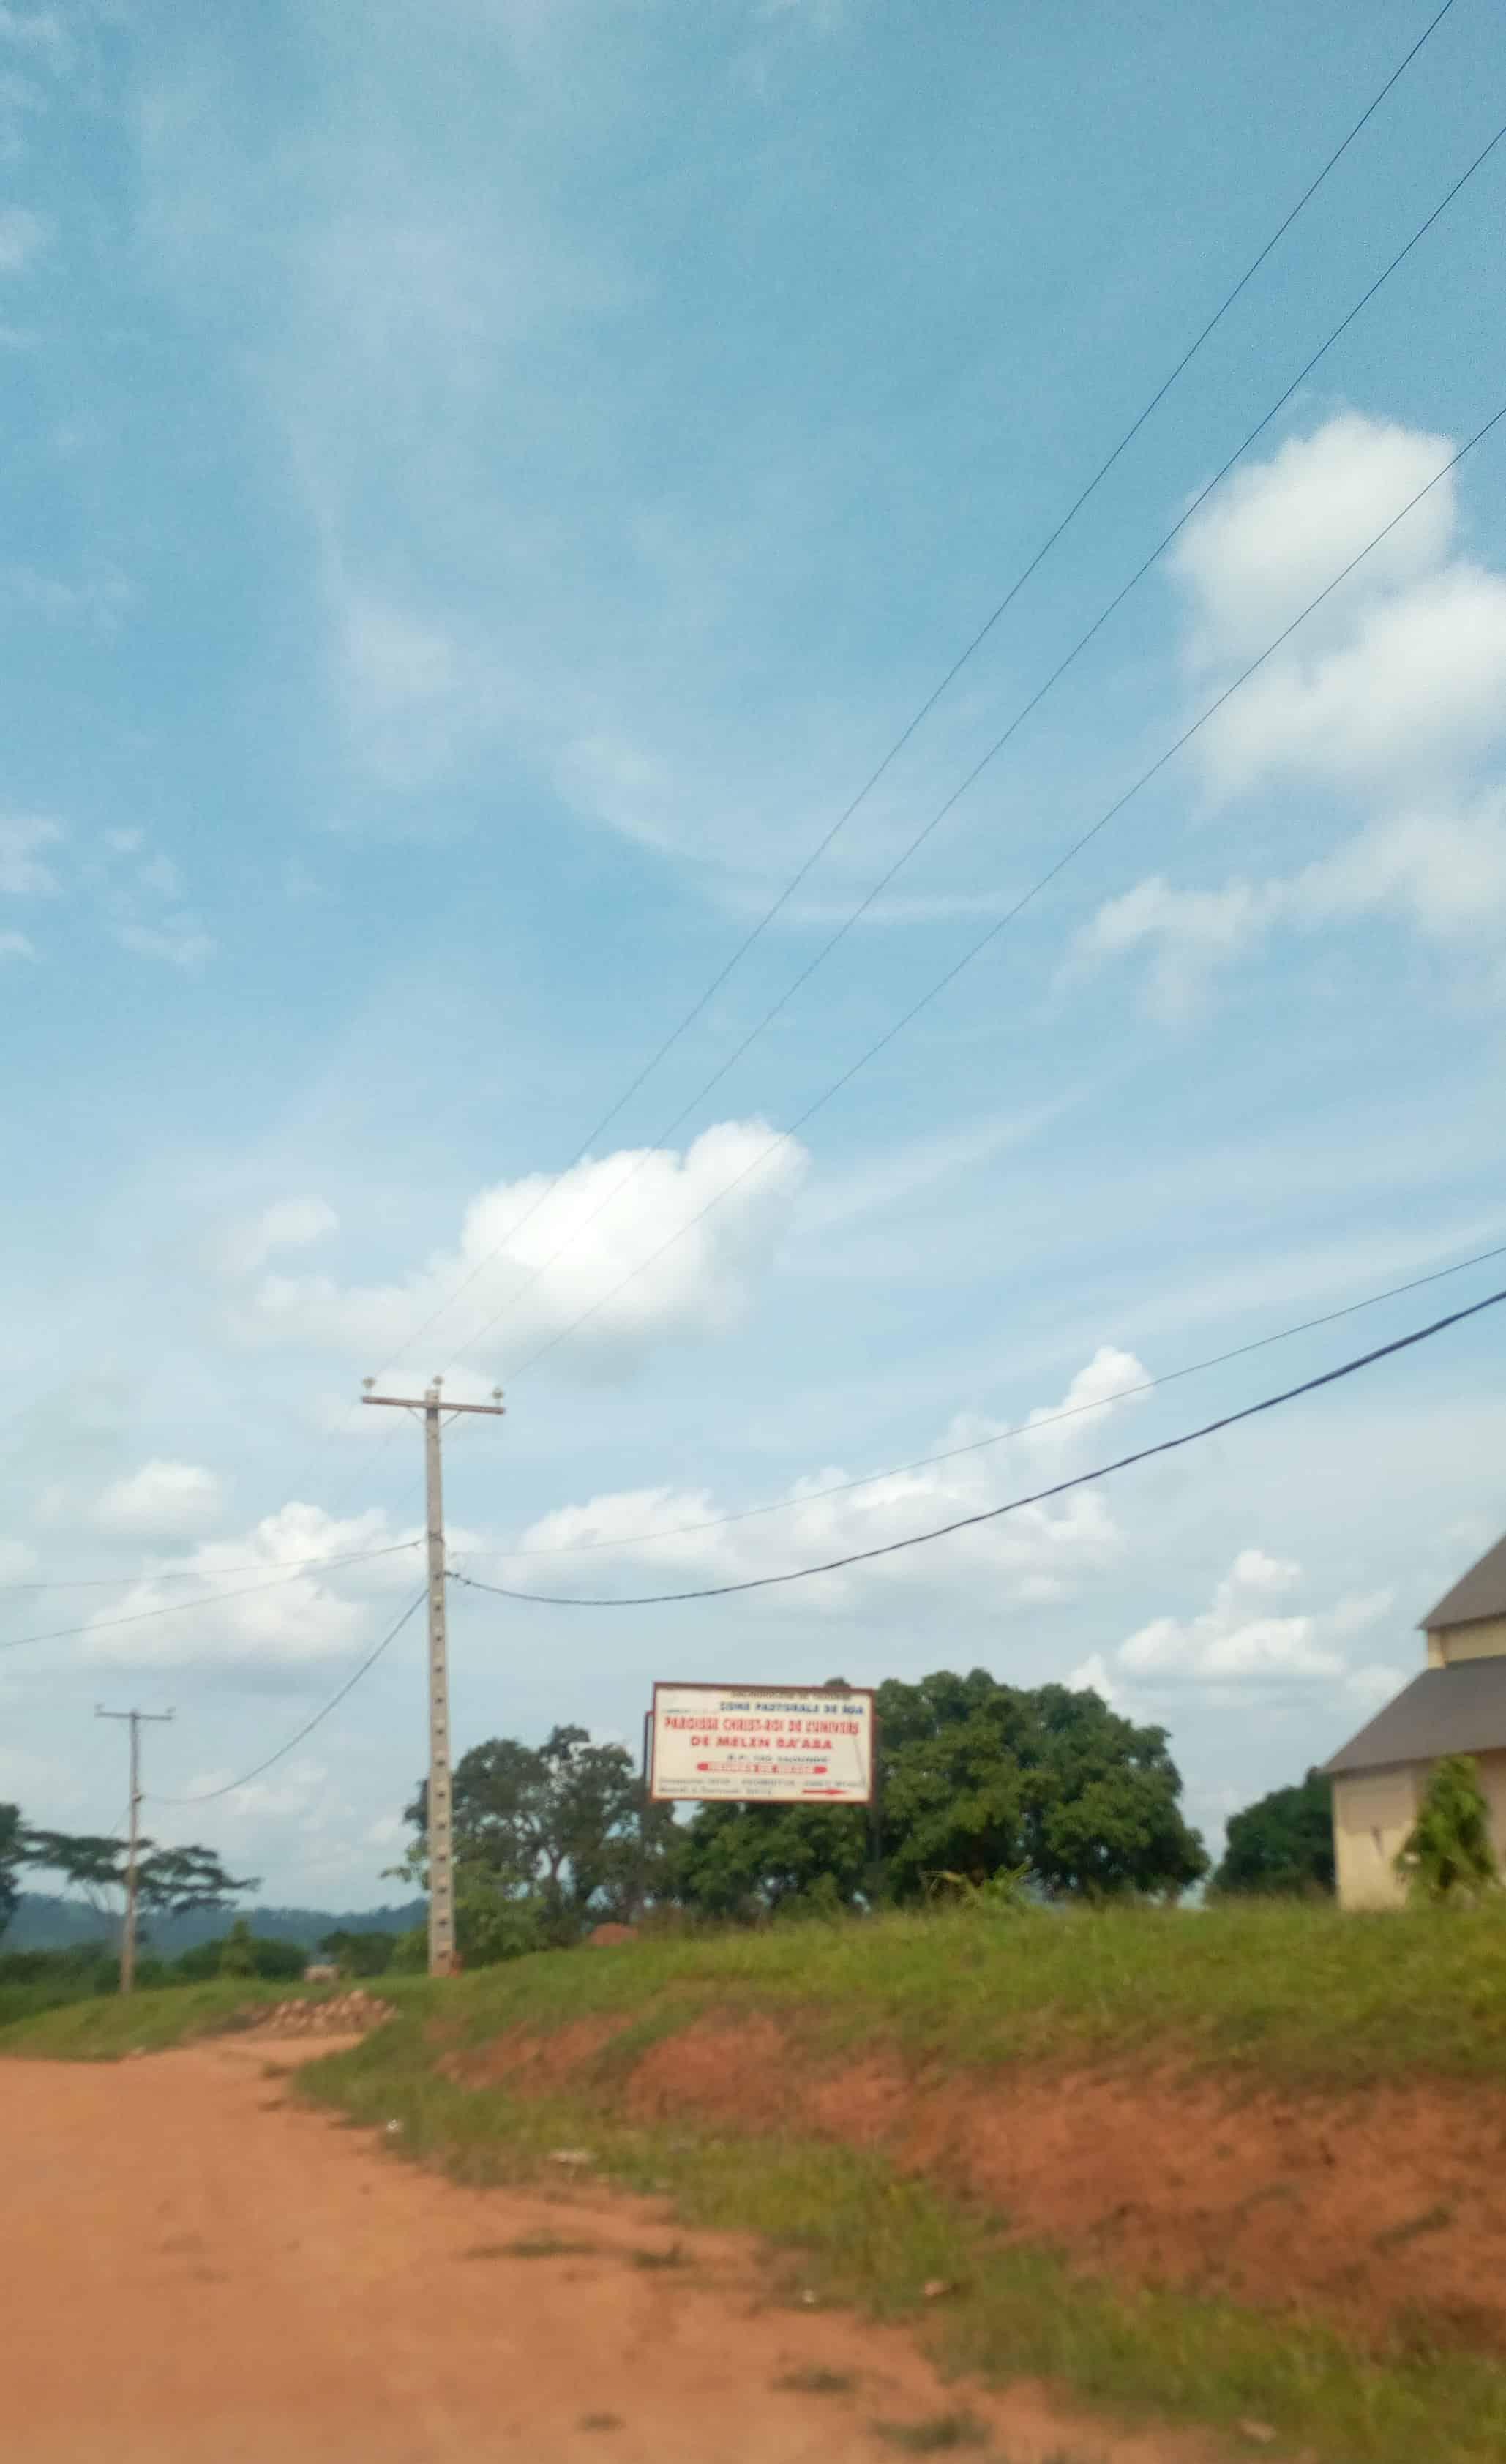 Land for sale at Yaoundé, Ntouessong, Nkolfoulou - 100000 m2 - 450 000 000 FCFA